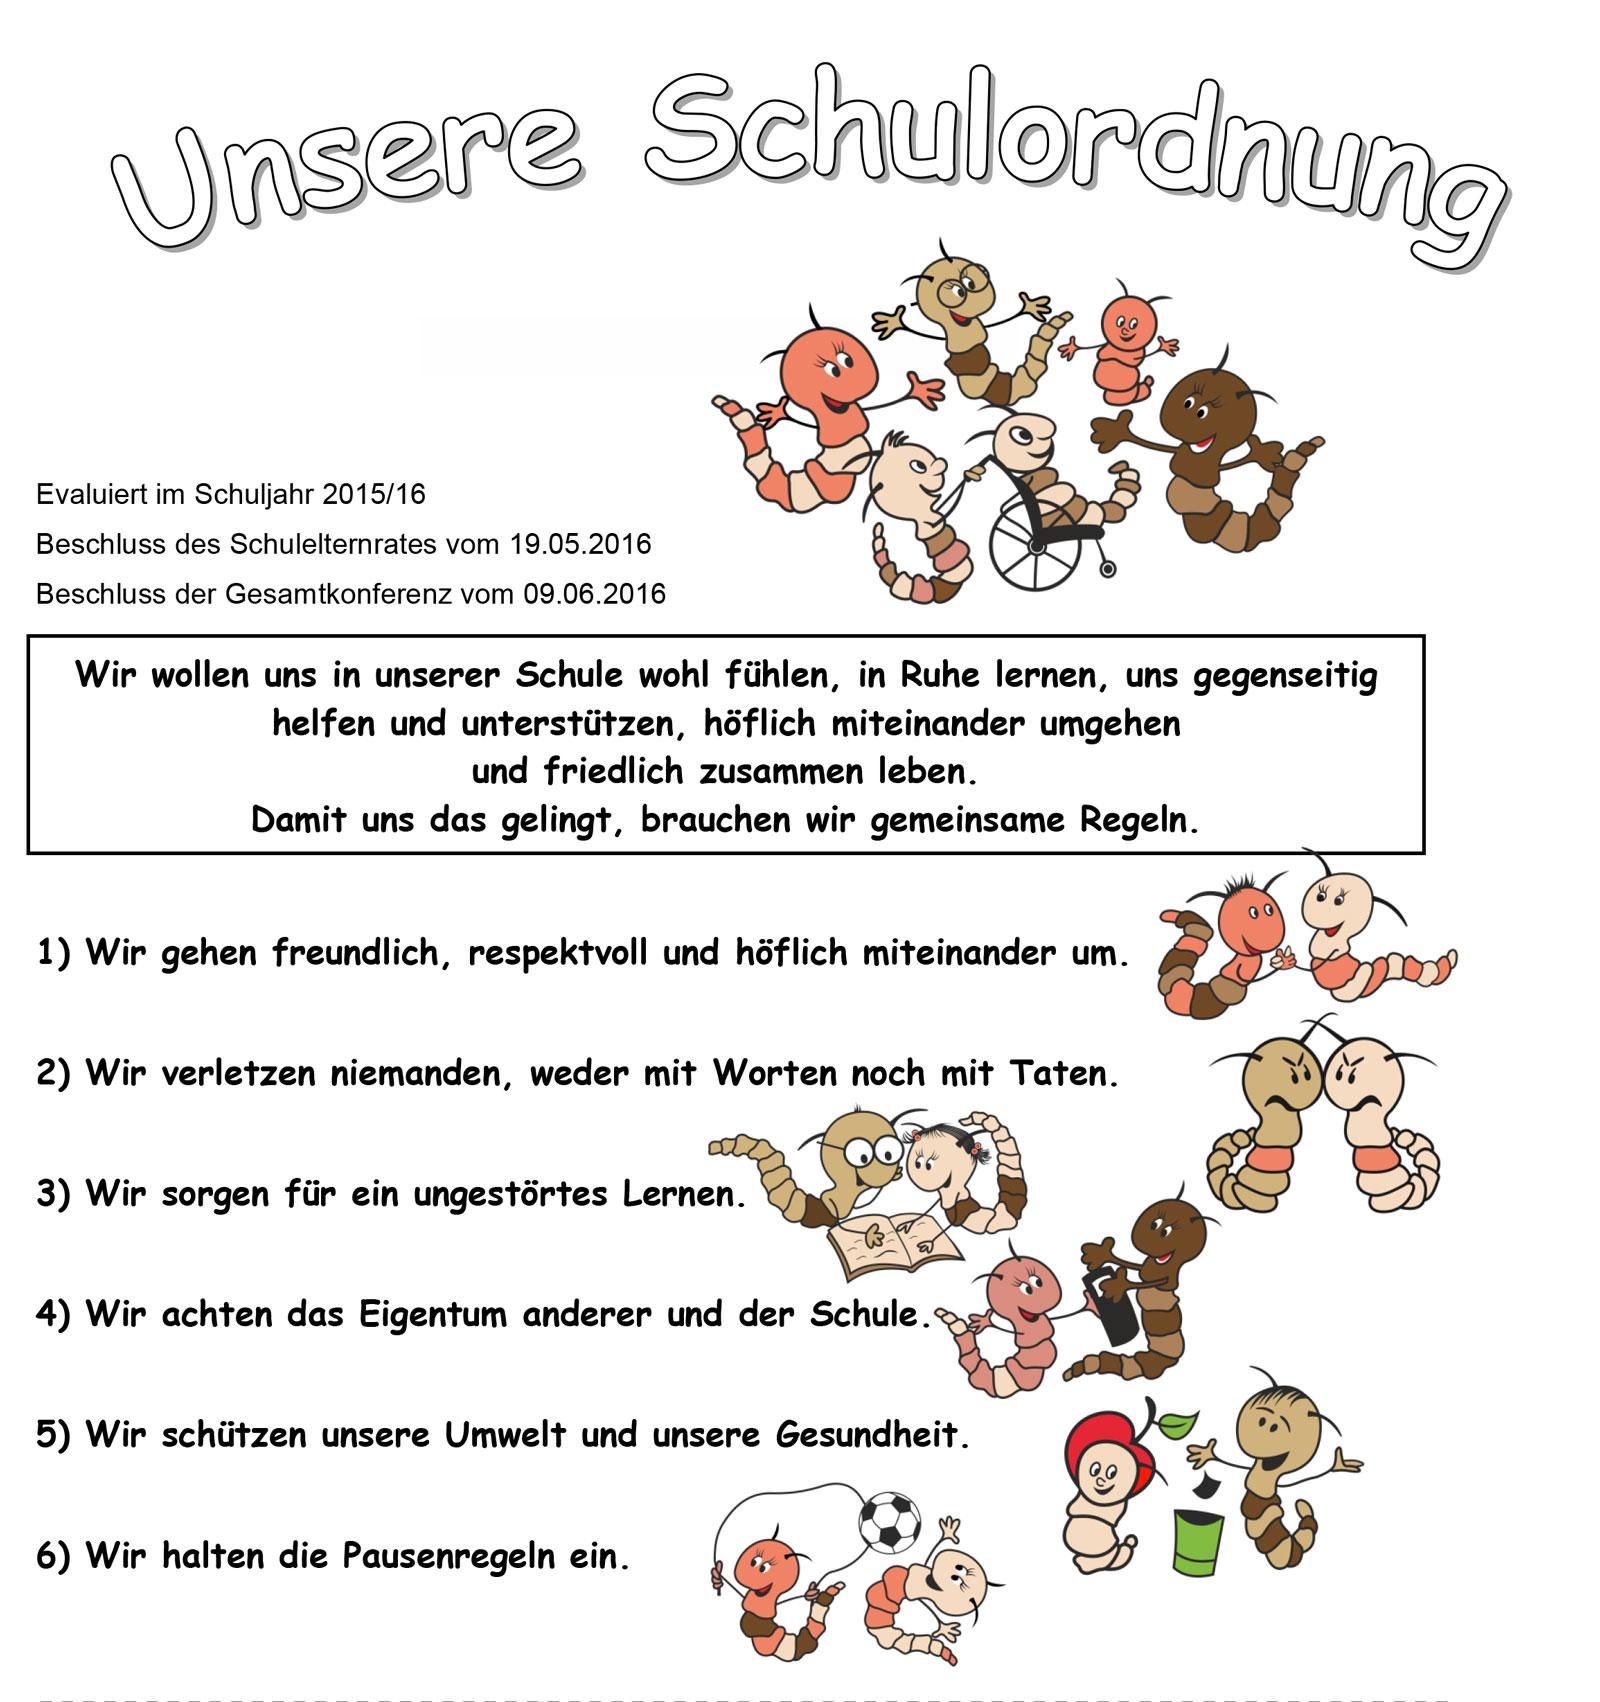 Frya-Fresena-Grundschule - Schulordnung